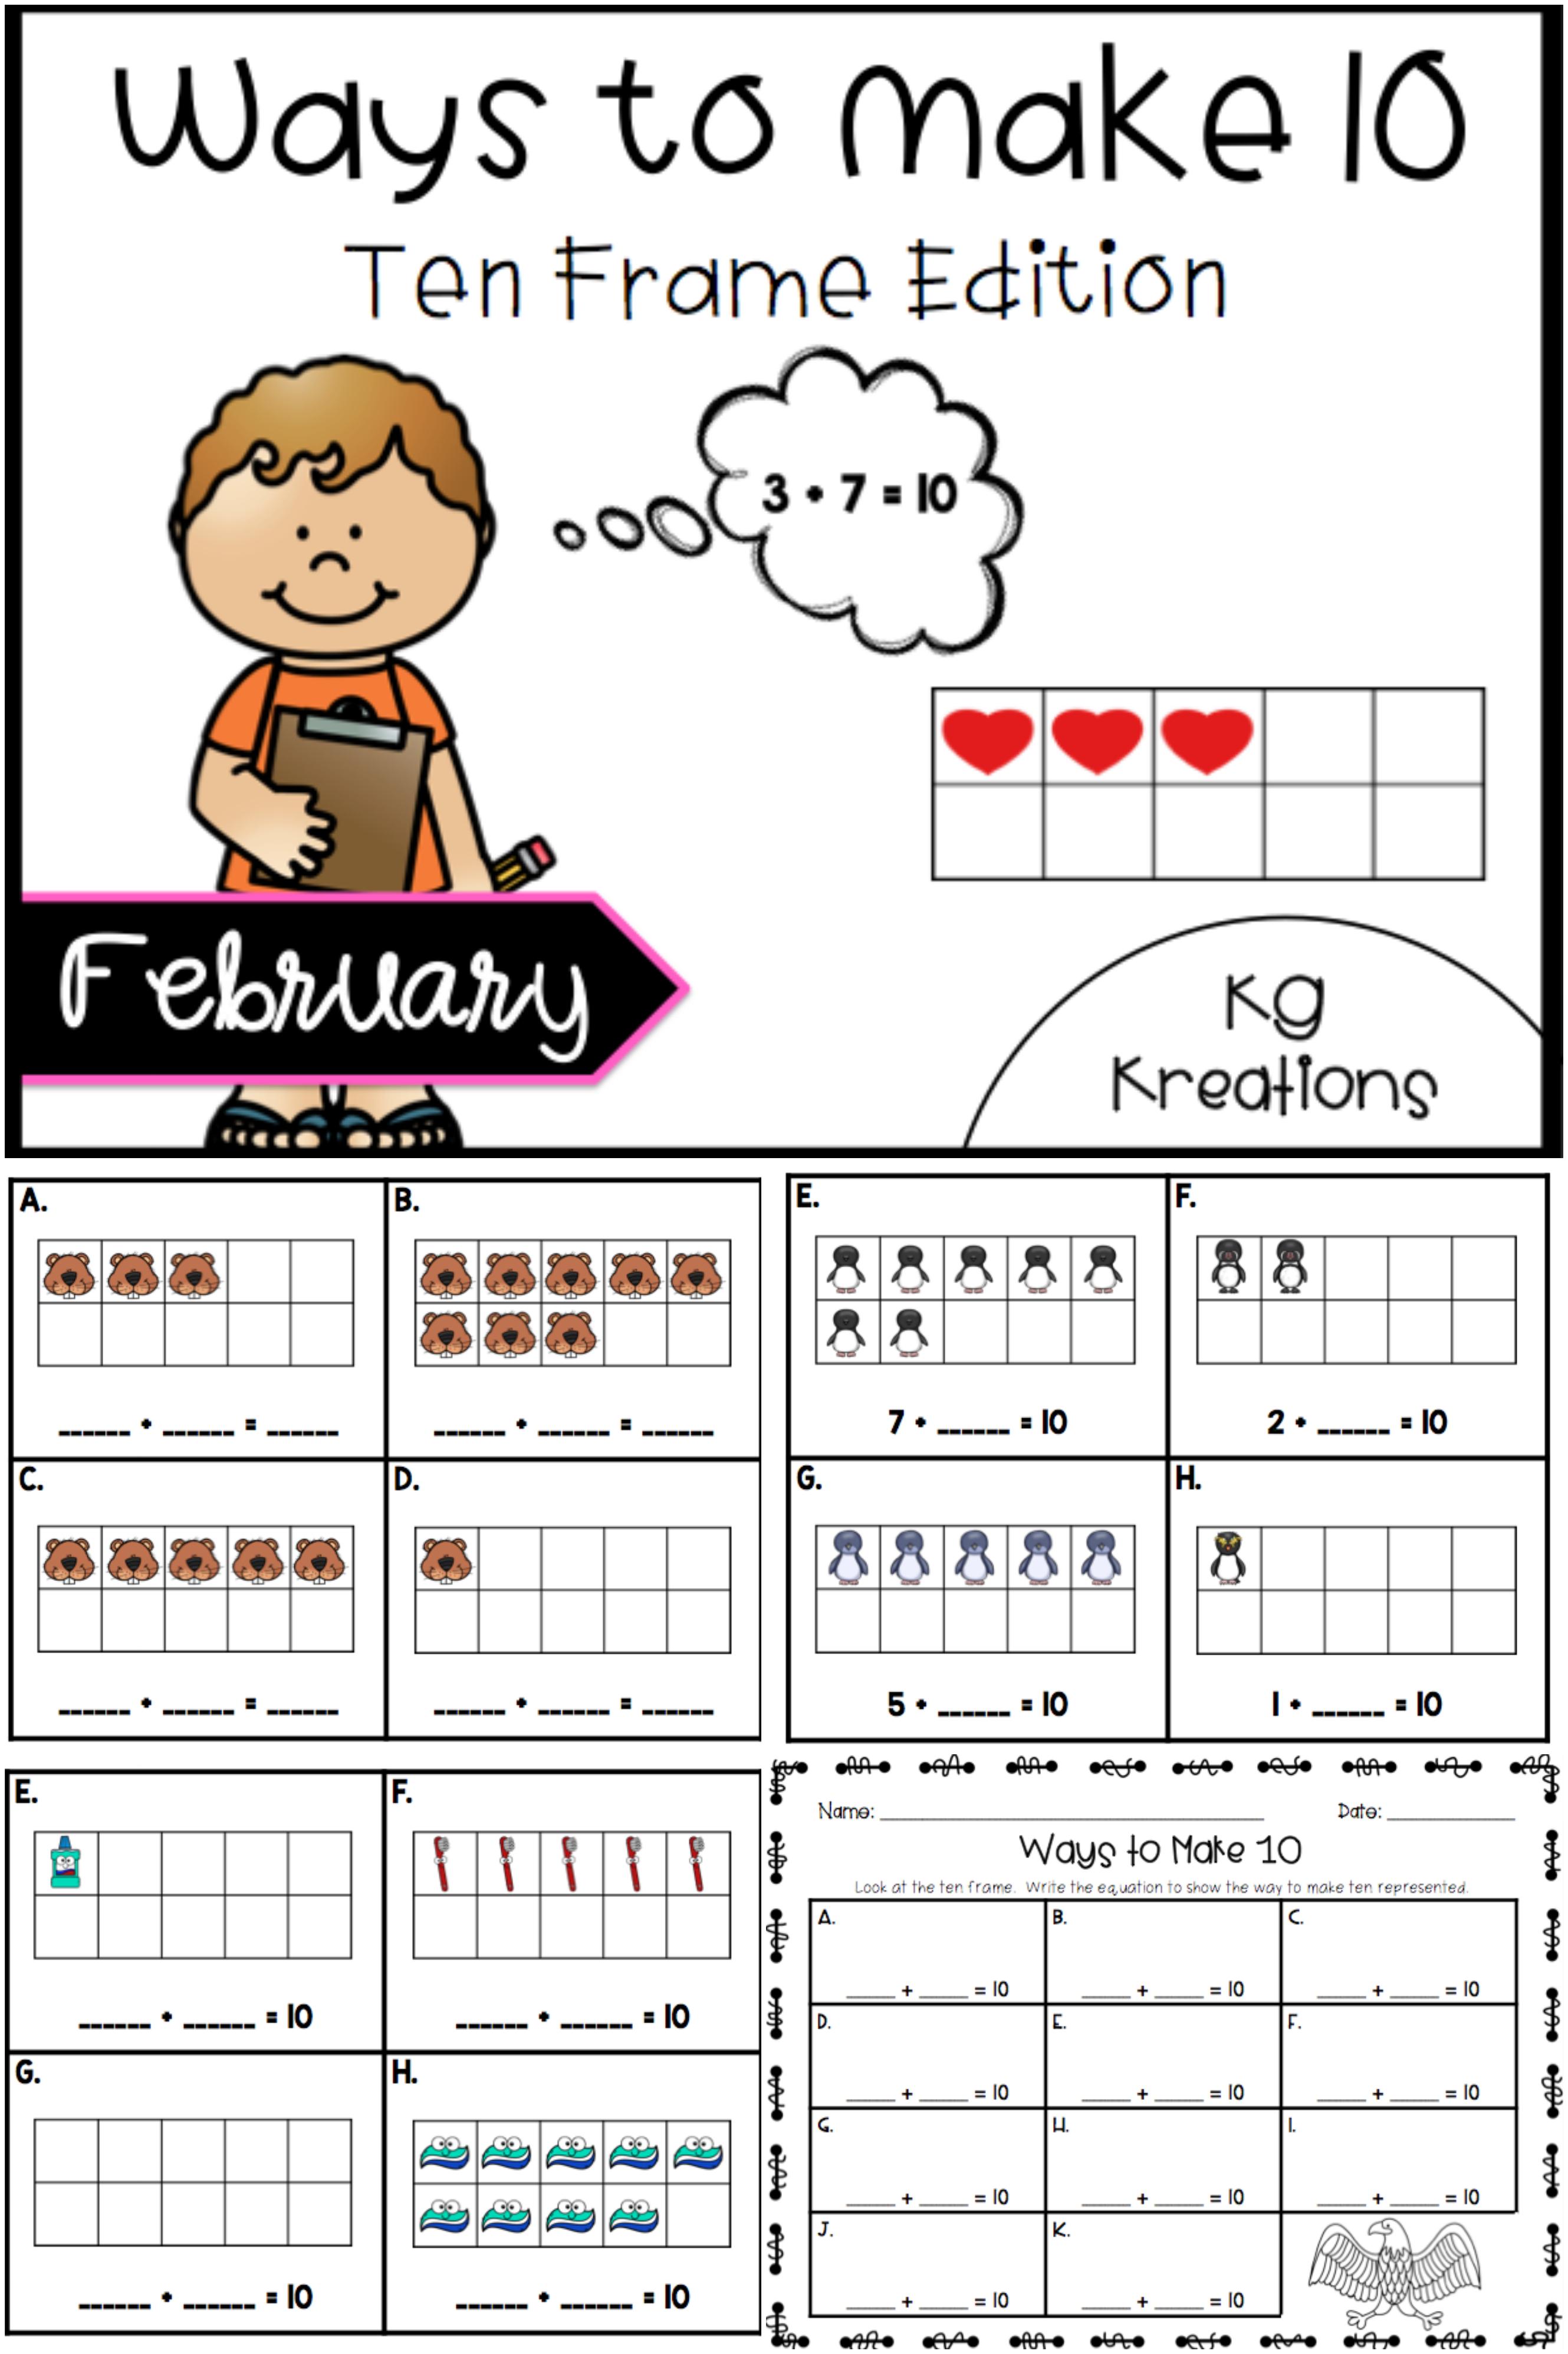 February Ways To Make 10